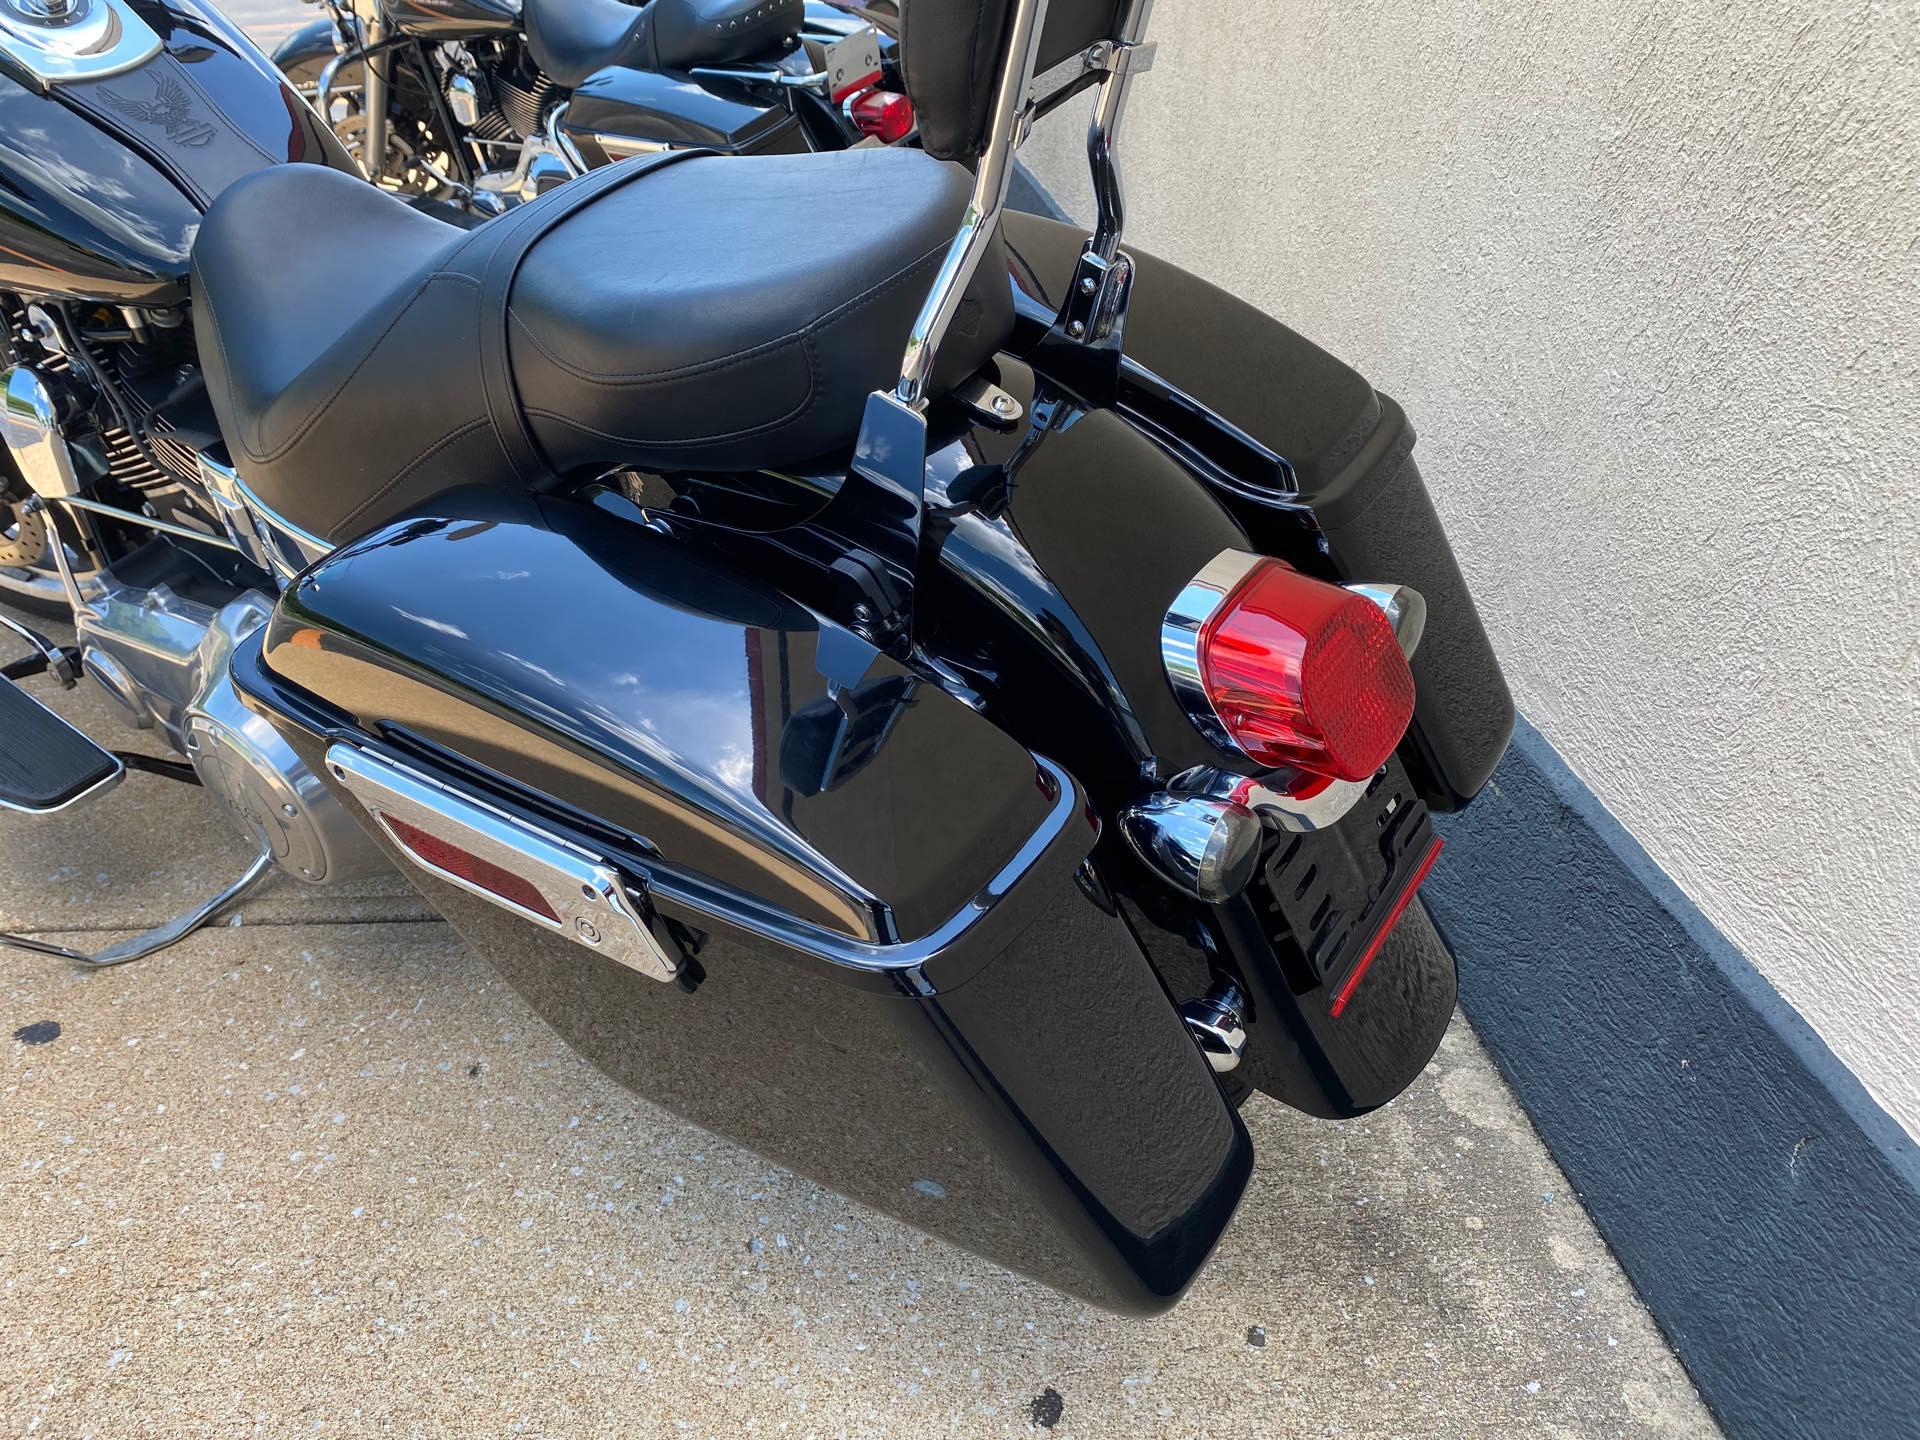 2014 Harley-Davidson Dyna Switchback at Gold Star Harley-Davidson